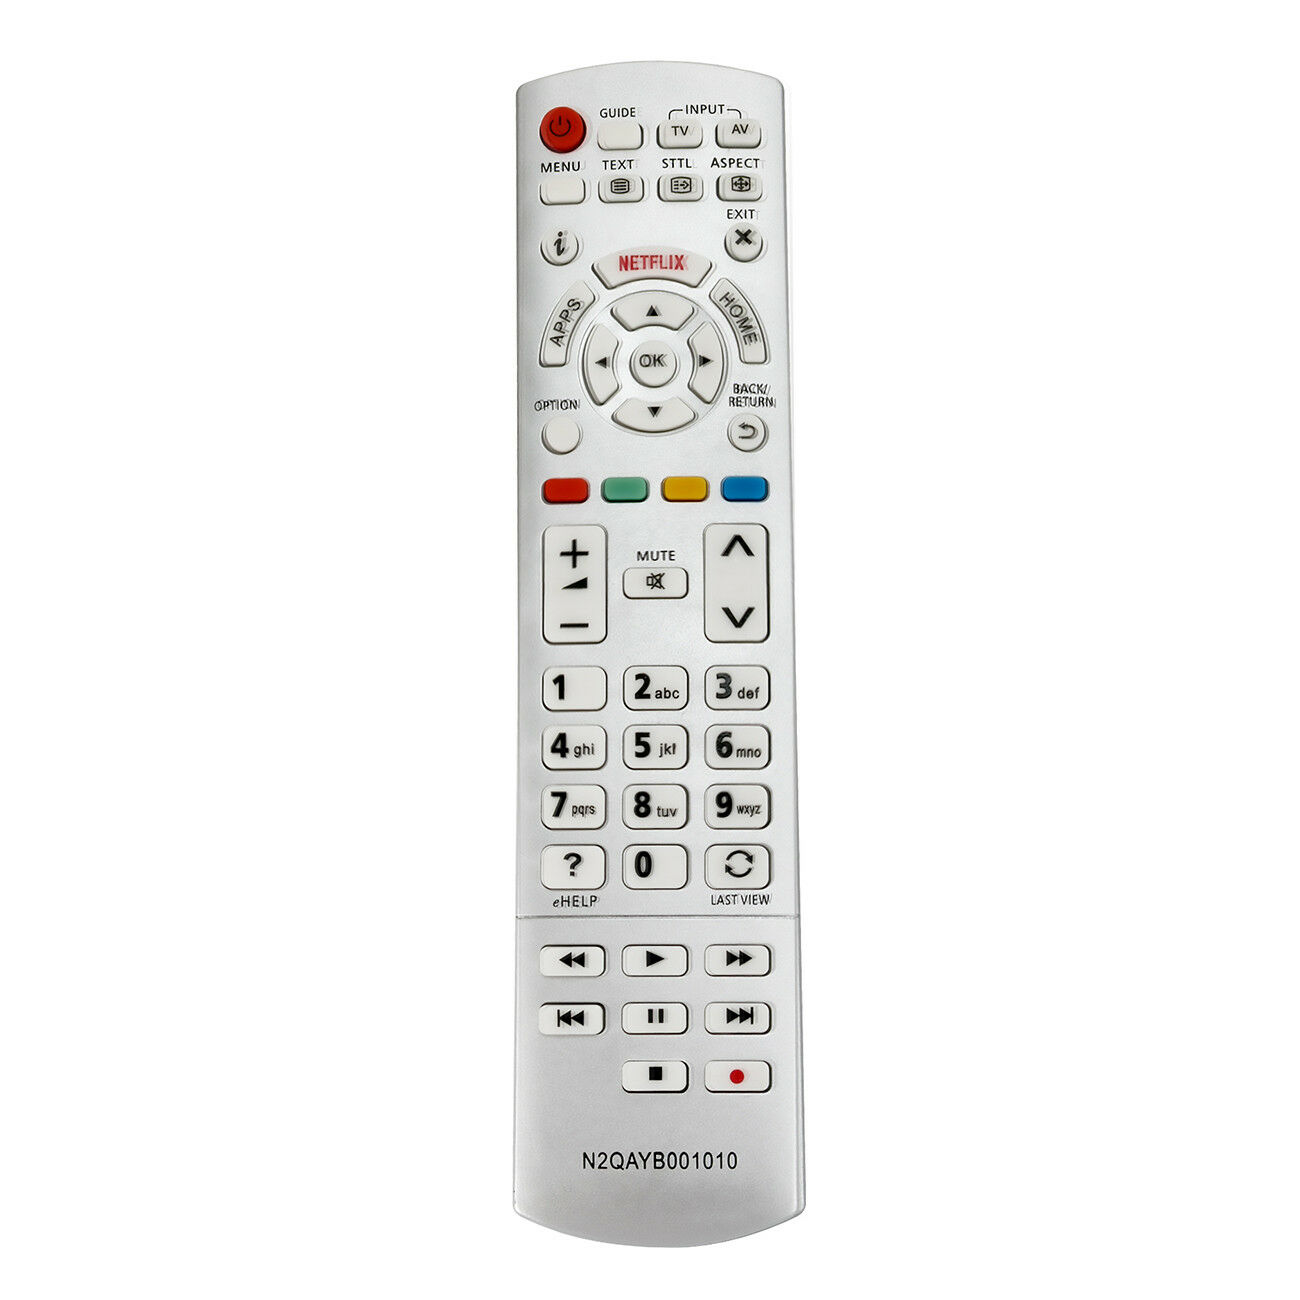 Nuevo reemplazo de control remoto N2QAYB001010 para Panasonic TV TX-50CS630E